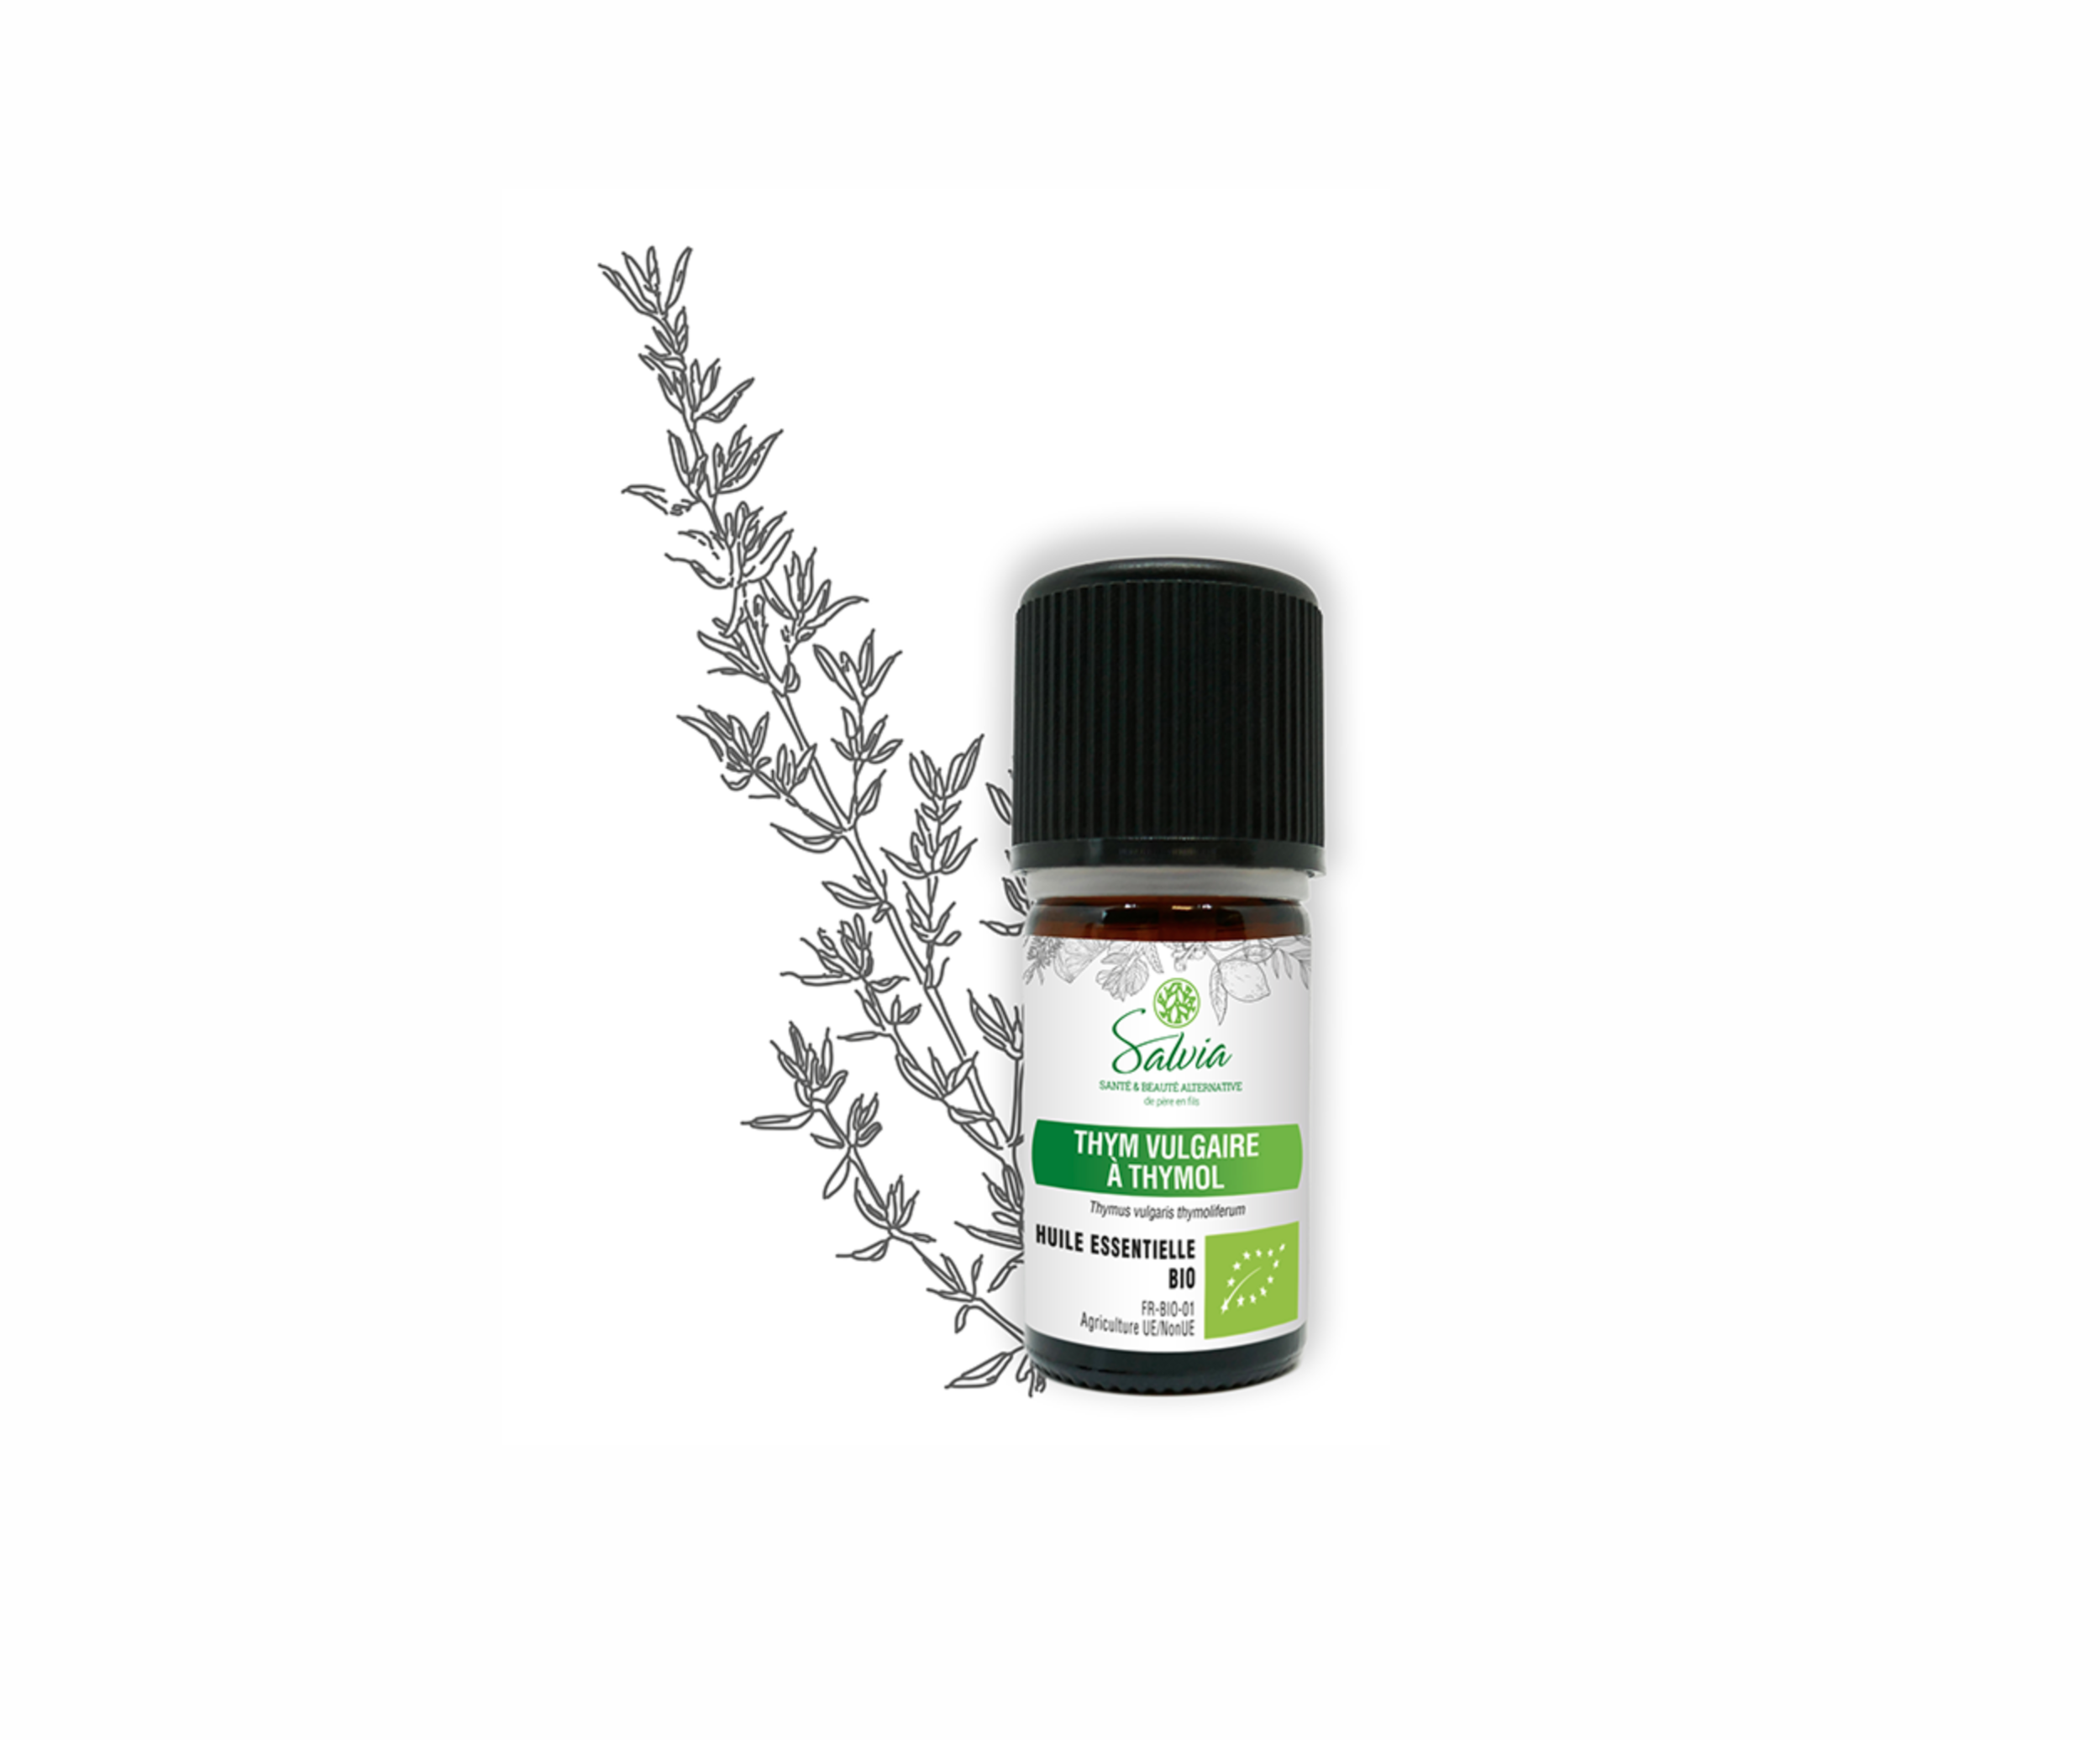 Huile essentielle de Thym Vulgaire à Thymol Bio - 5 ml